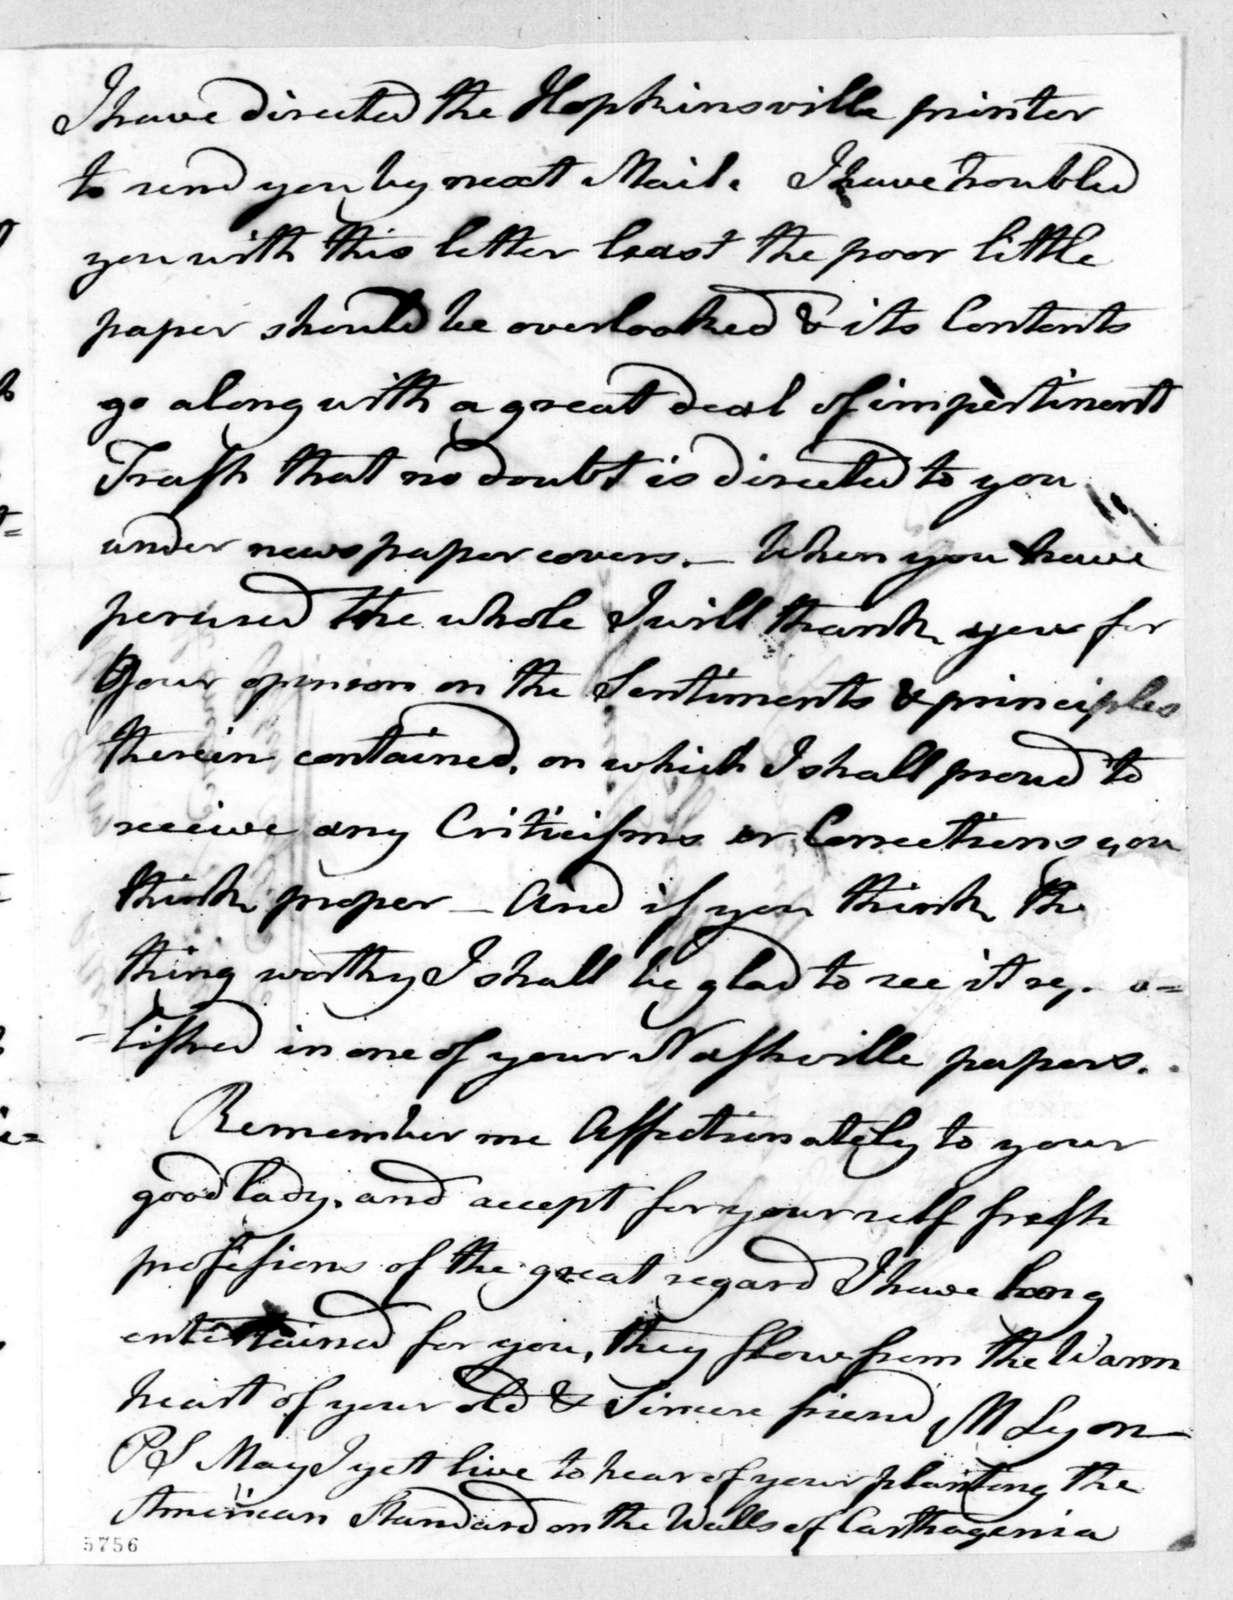 Matthew Lyon to Andrew Jackson, August 26, 1816